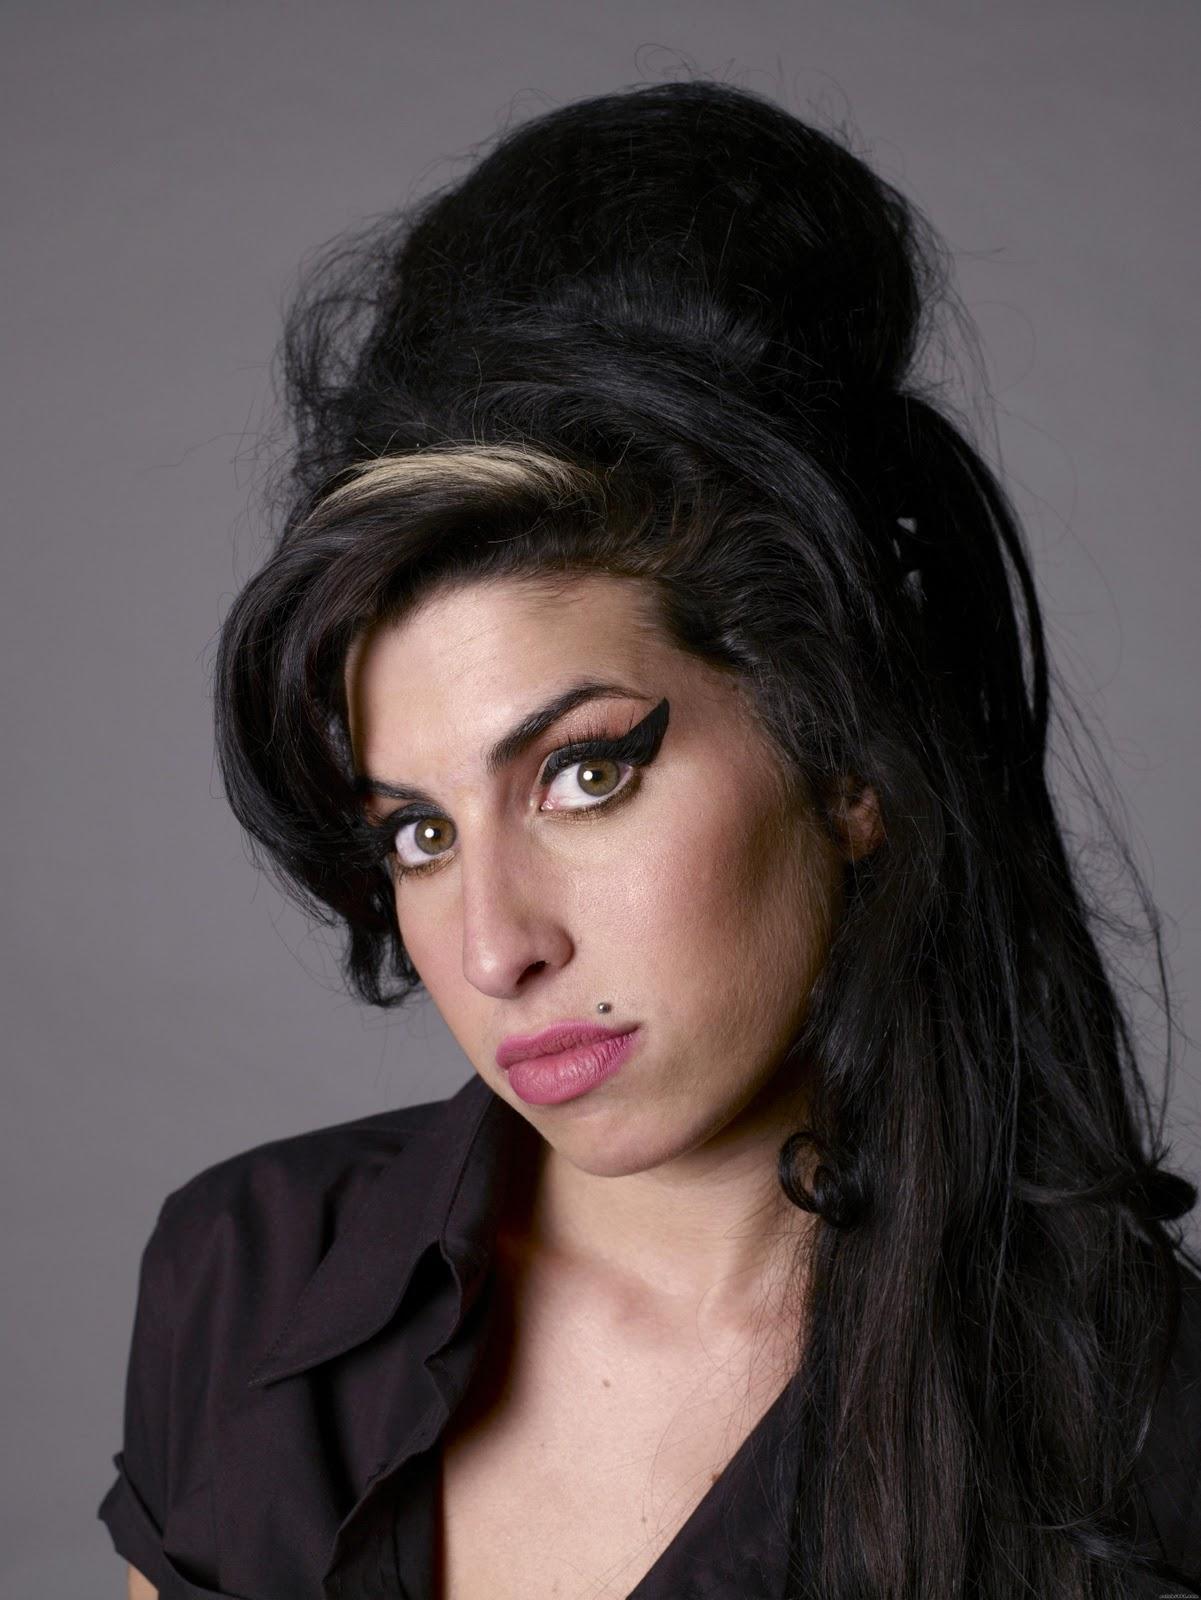 http://4.bp.blogspot.com/-BGftlAia3q4/TseZY2HC5XI/AAAAAAAACBU/5ESi_fhLoH0/s1600/Amy+Winehouse.jpg